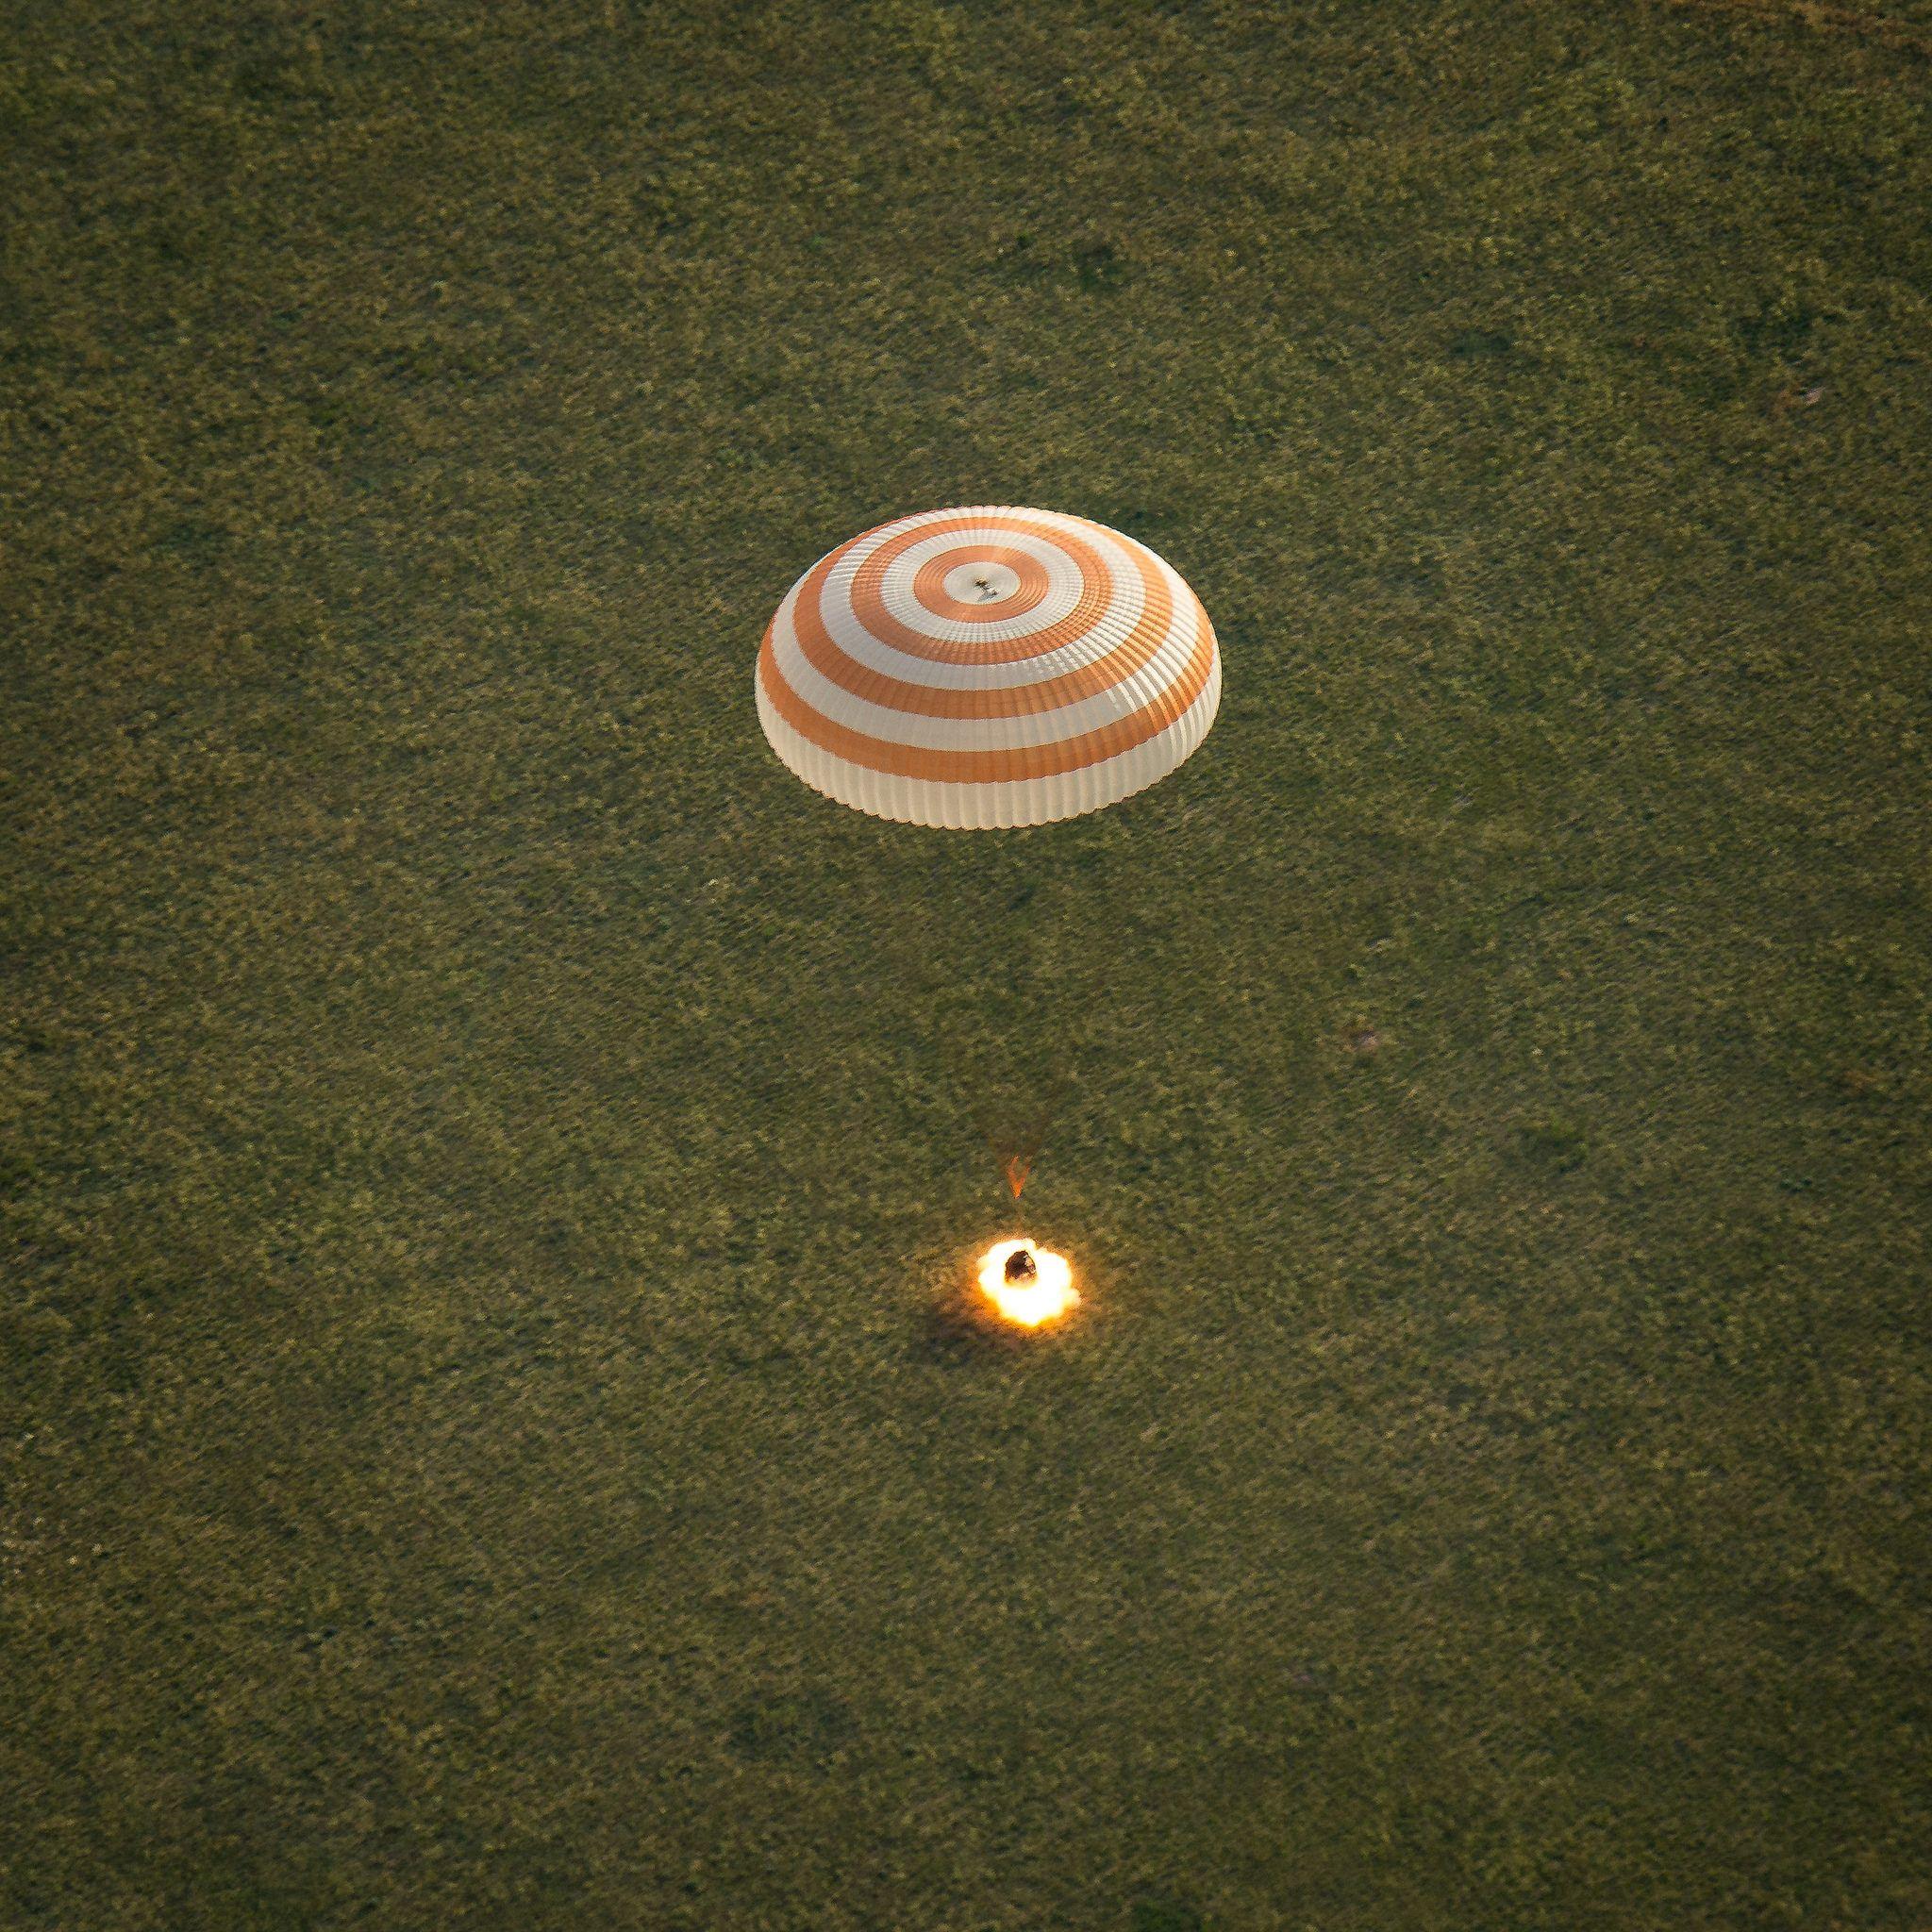 Soyuz TMA-15M allume ses retrofusees à 70cm du sol